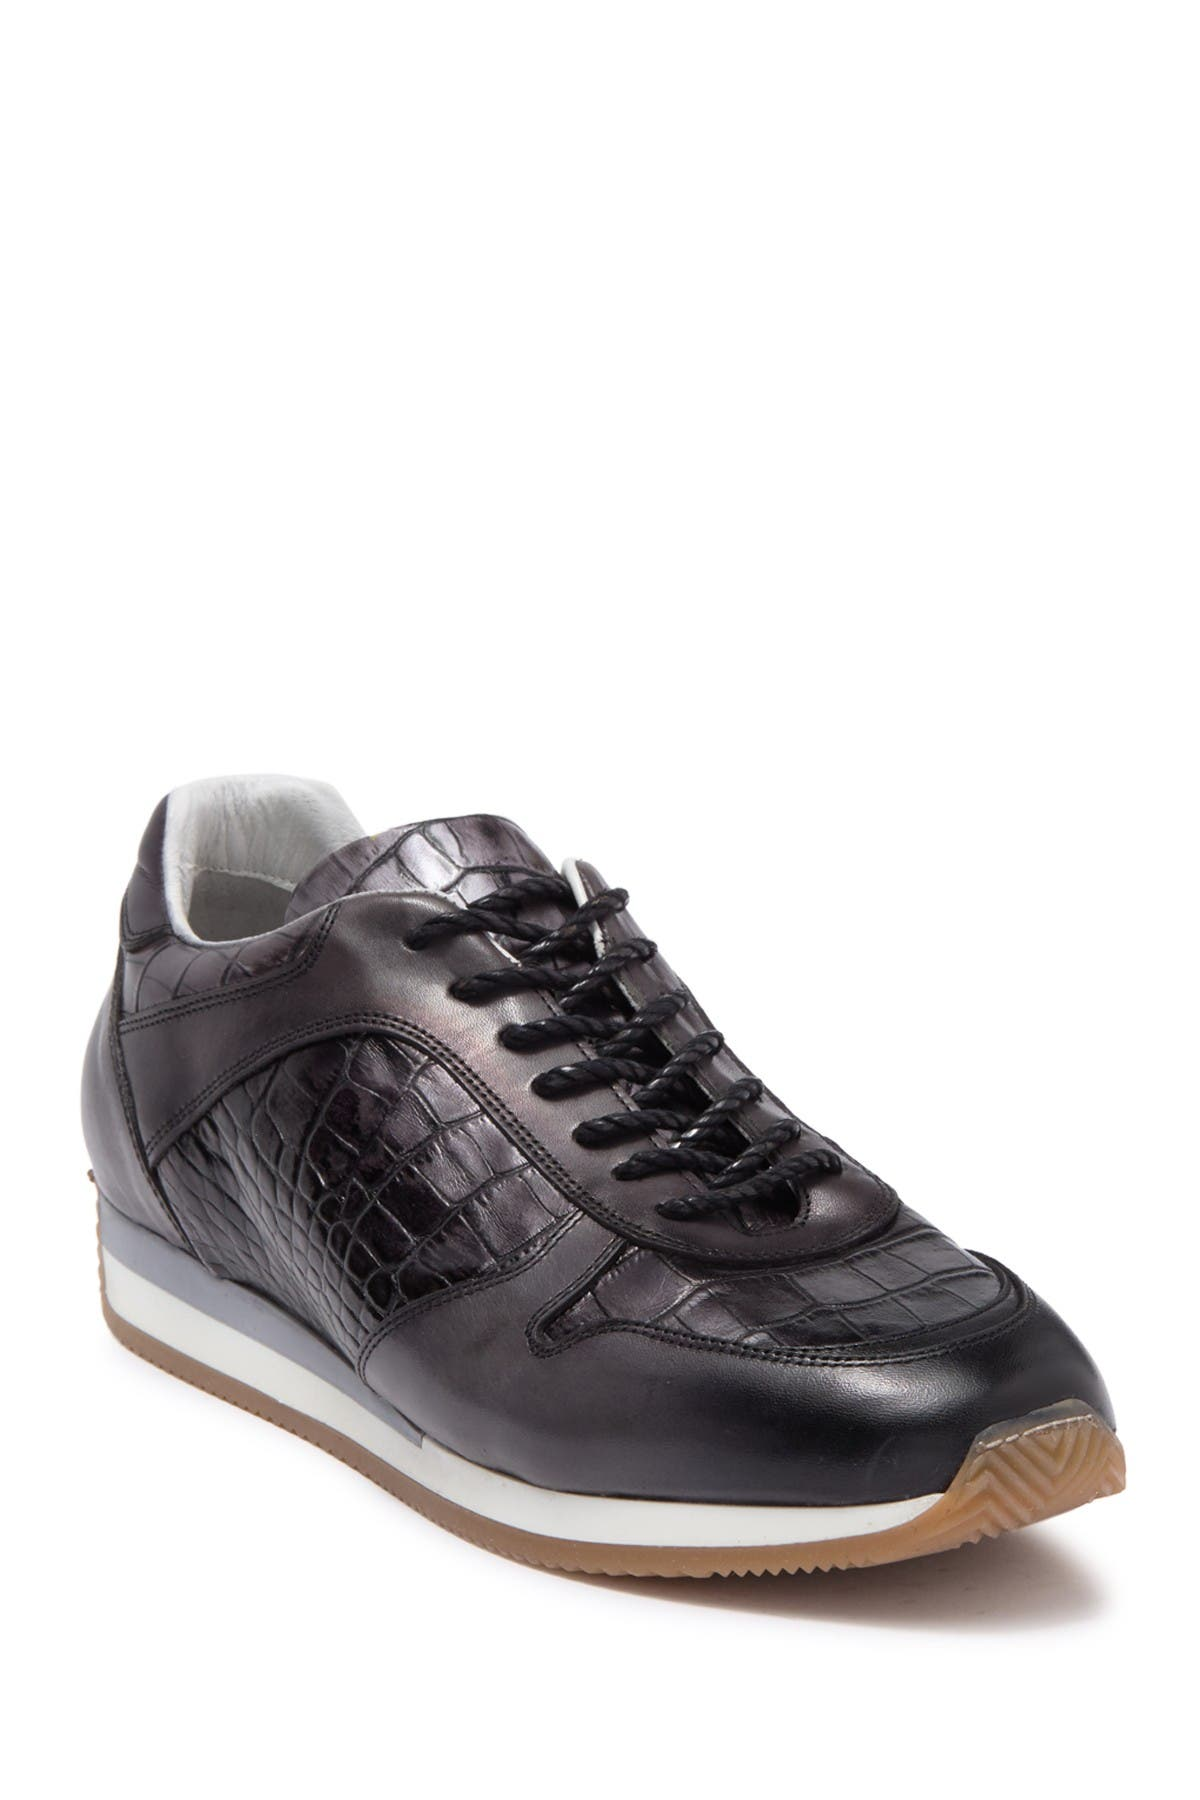 Image of SEPOL Norcia Sneaker